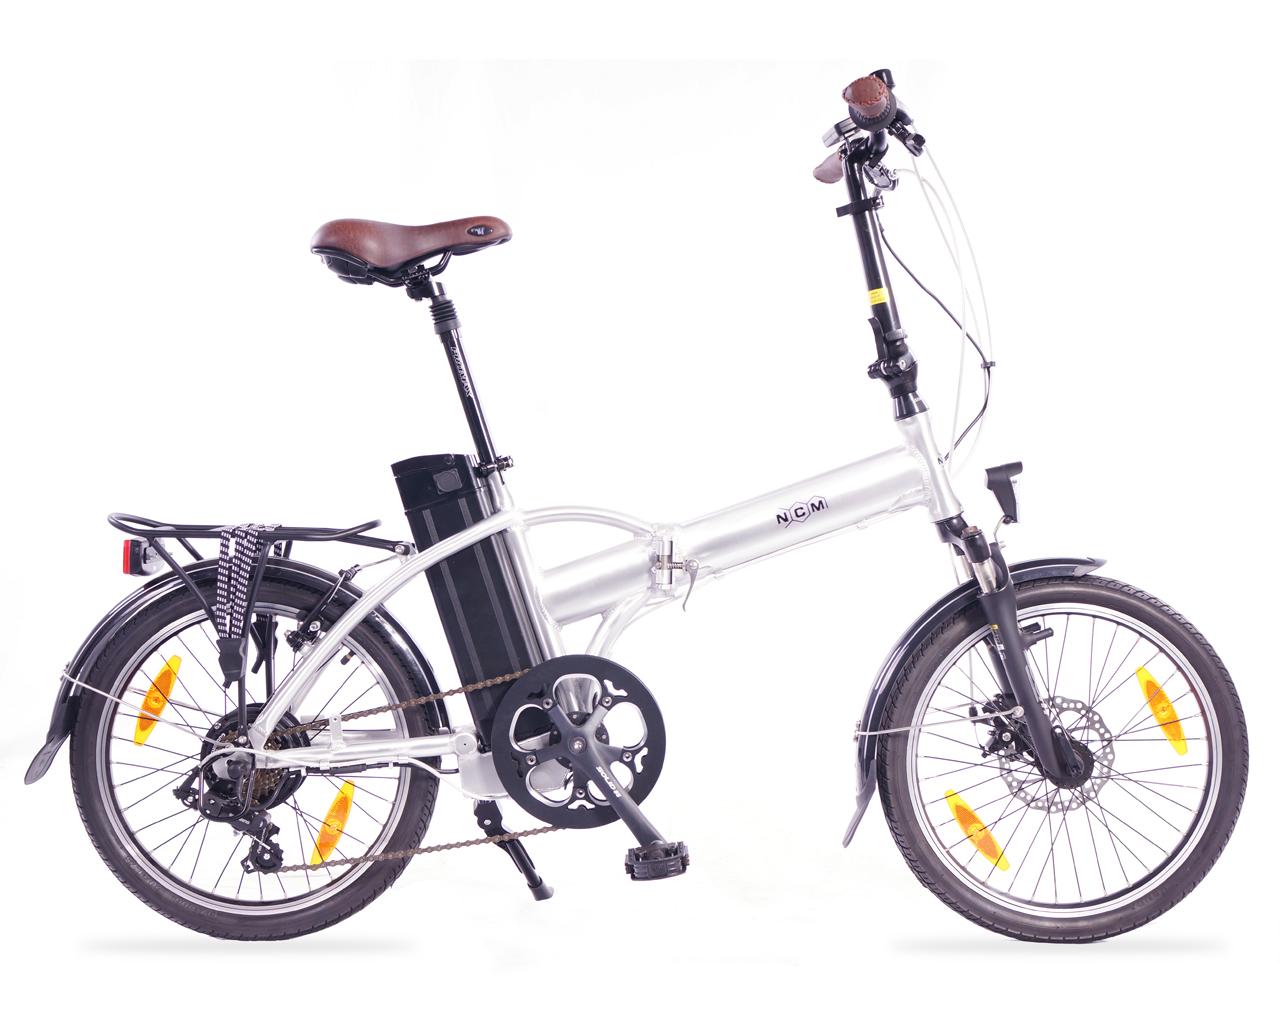 elektrofahrrad e bike 20 zoll faltrad london 36v 250w. Black Bedroom Furniture Sets. Home Design Ideas